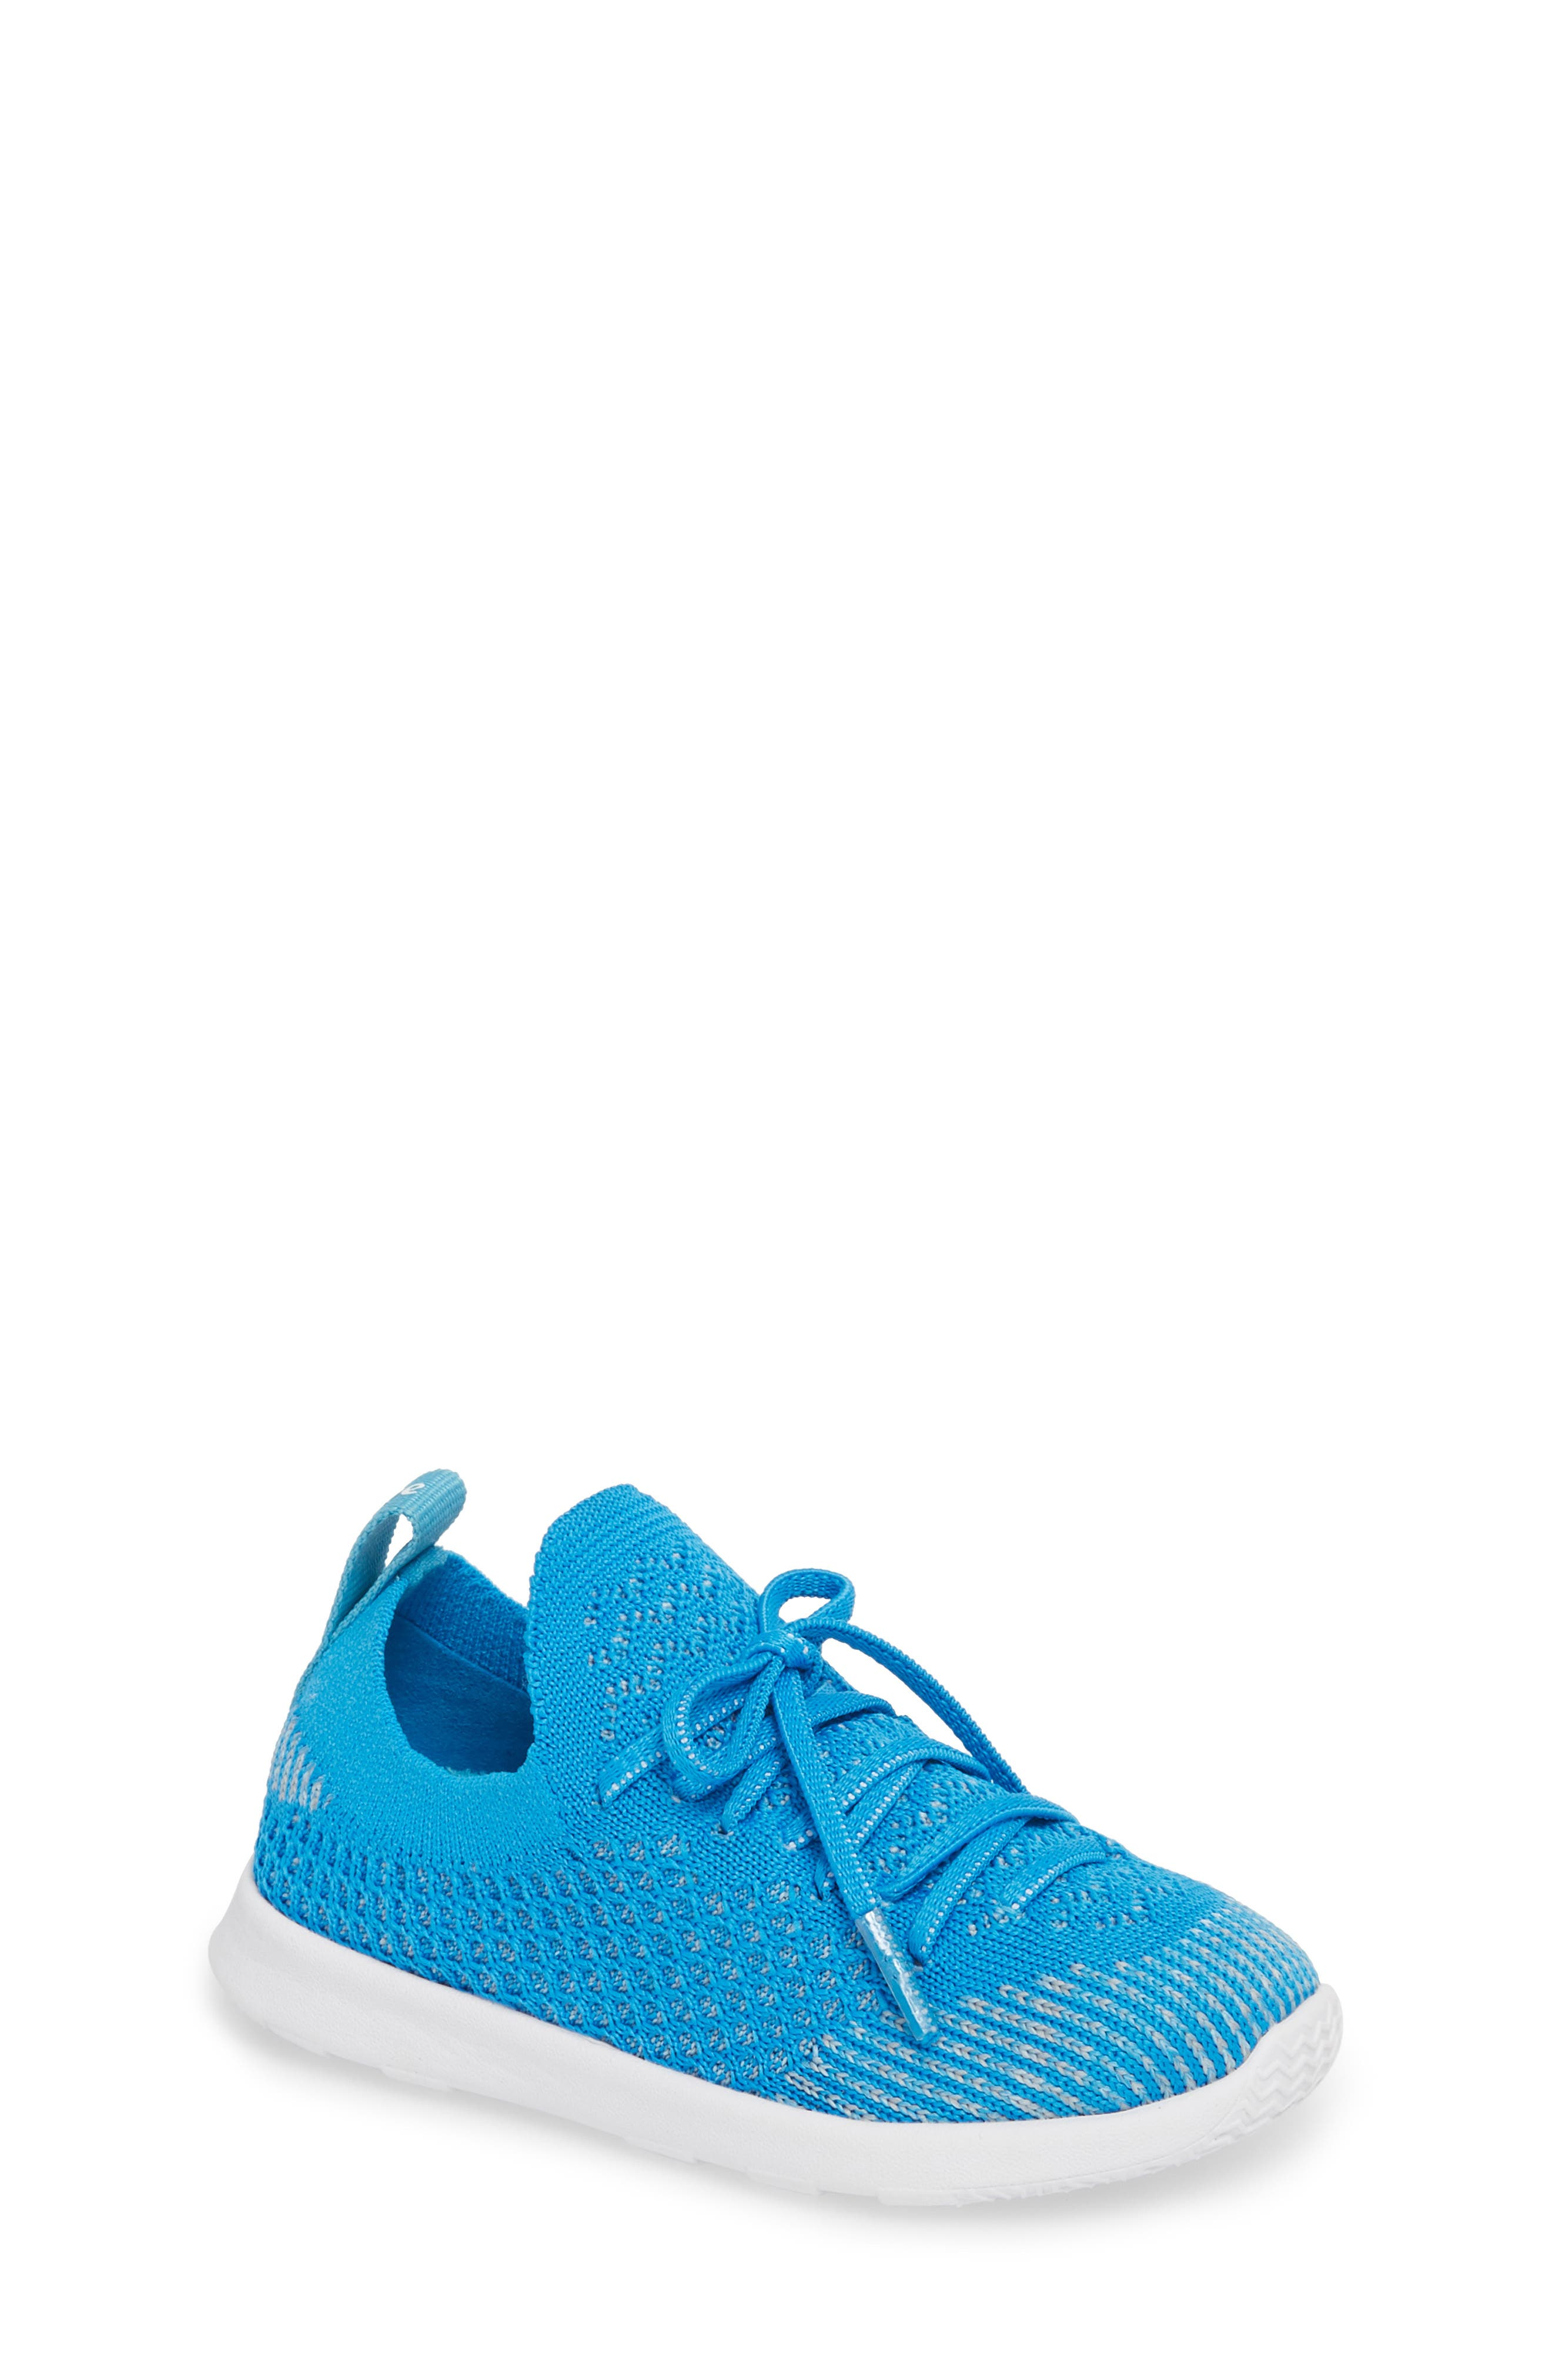 AP Mercury LiteKnit Sneaker,                             Main thumbnail 1, color,                             Wave Blue/ Shell White